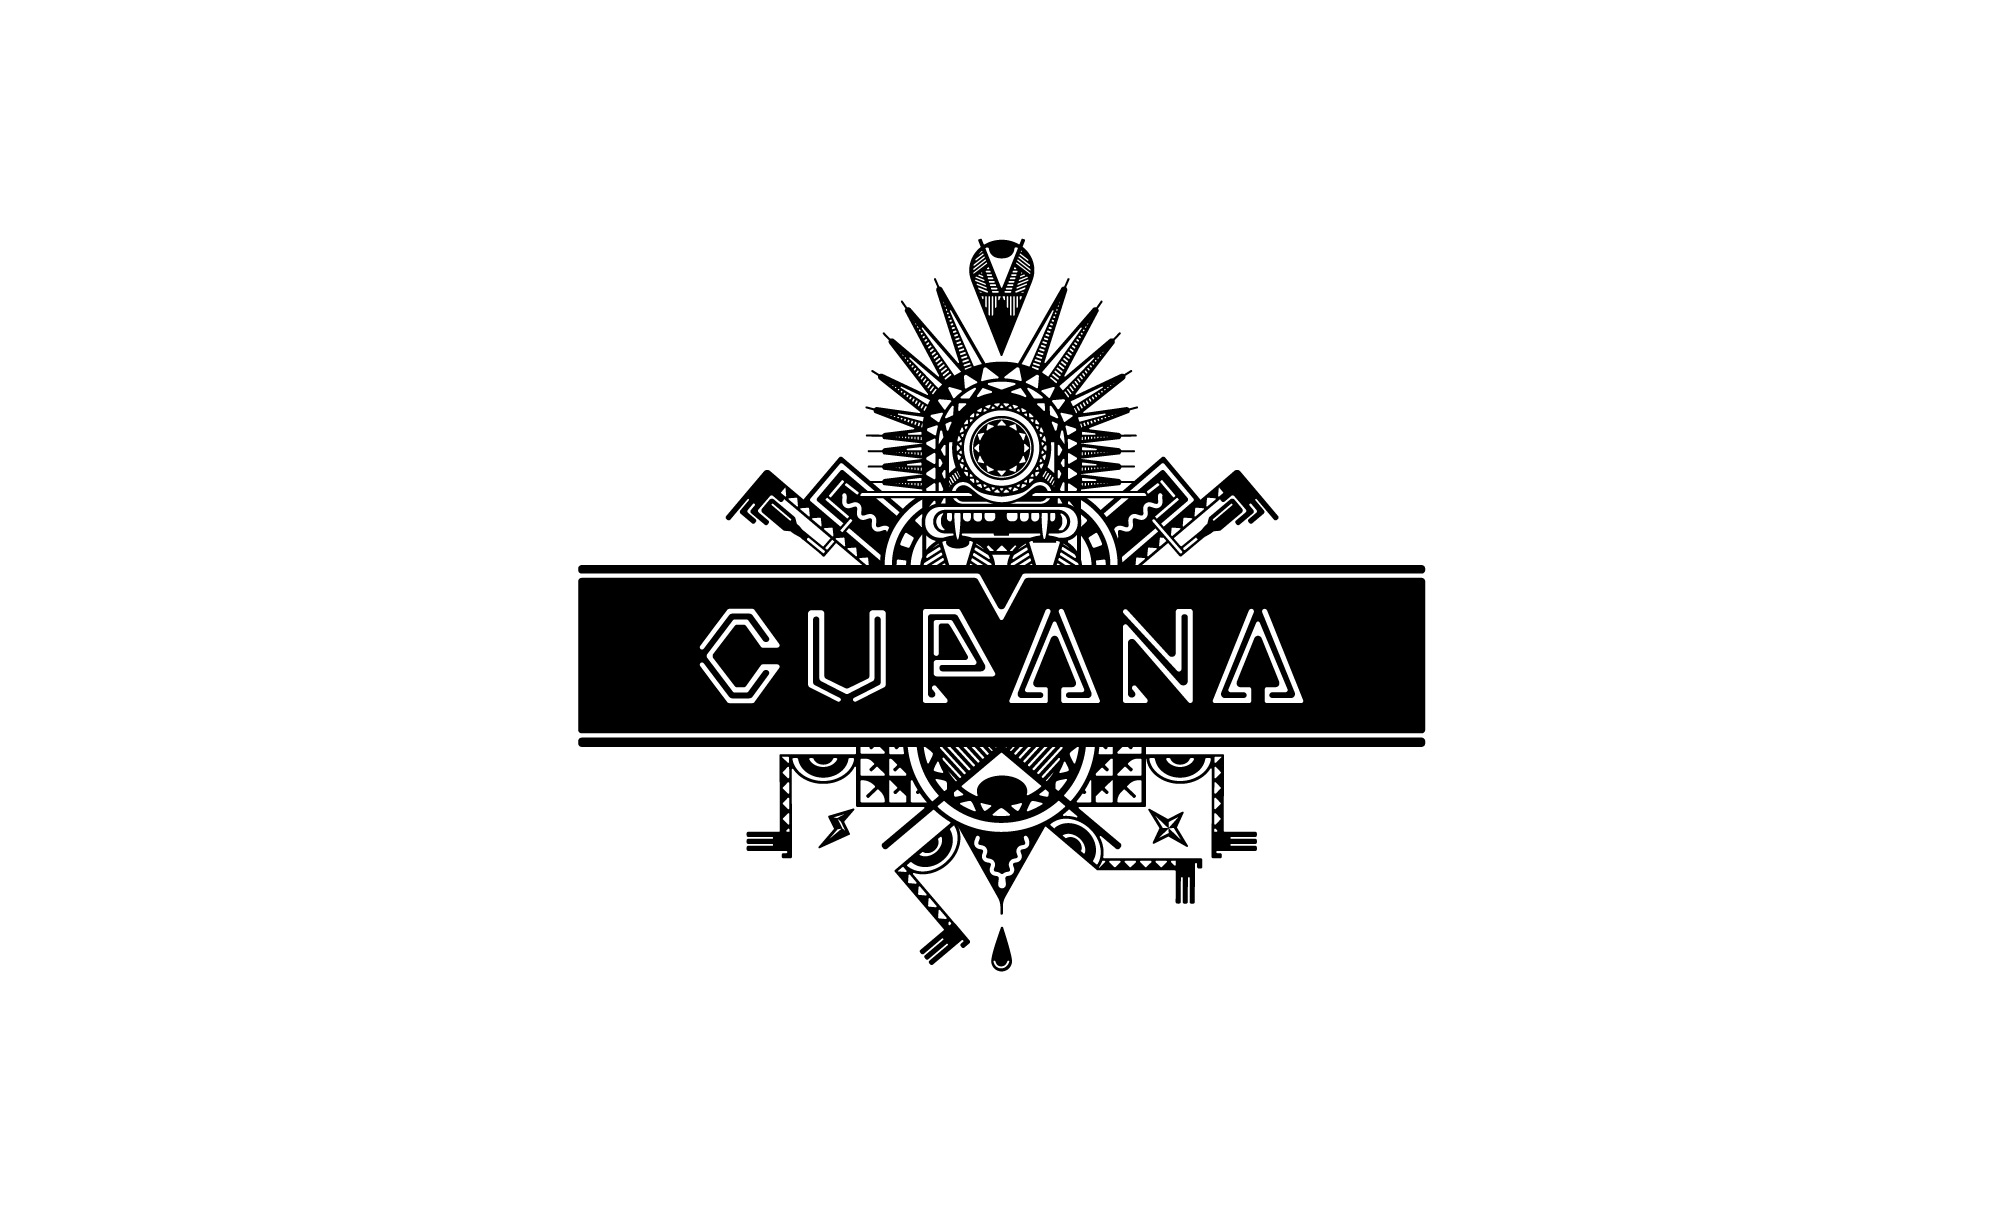 cupana logo